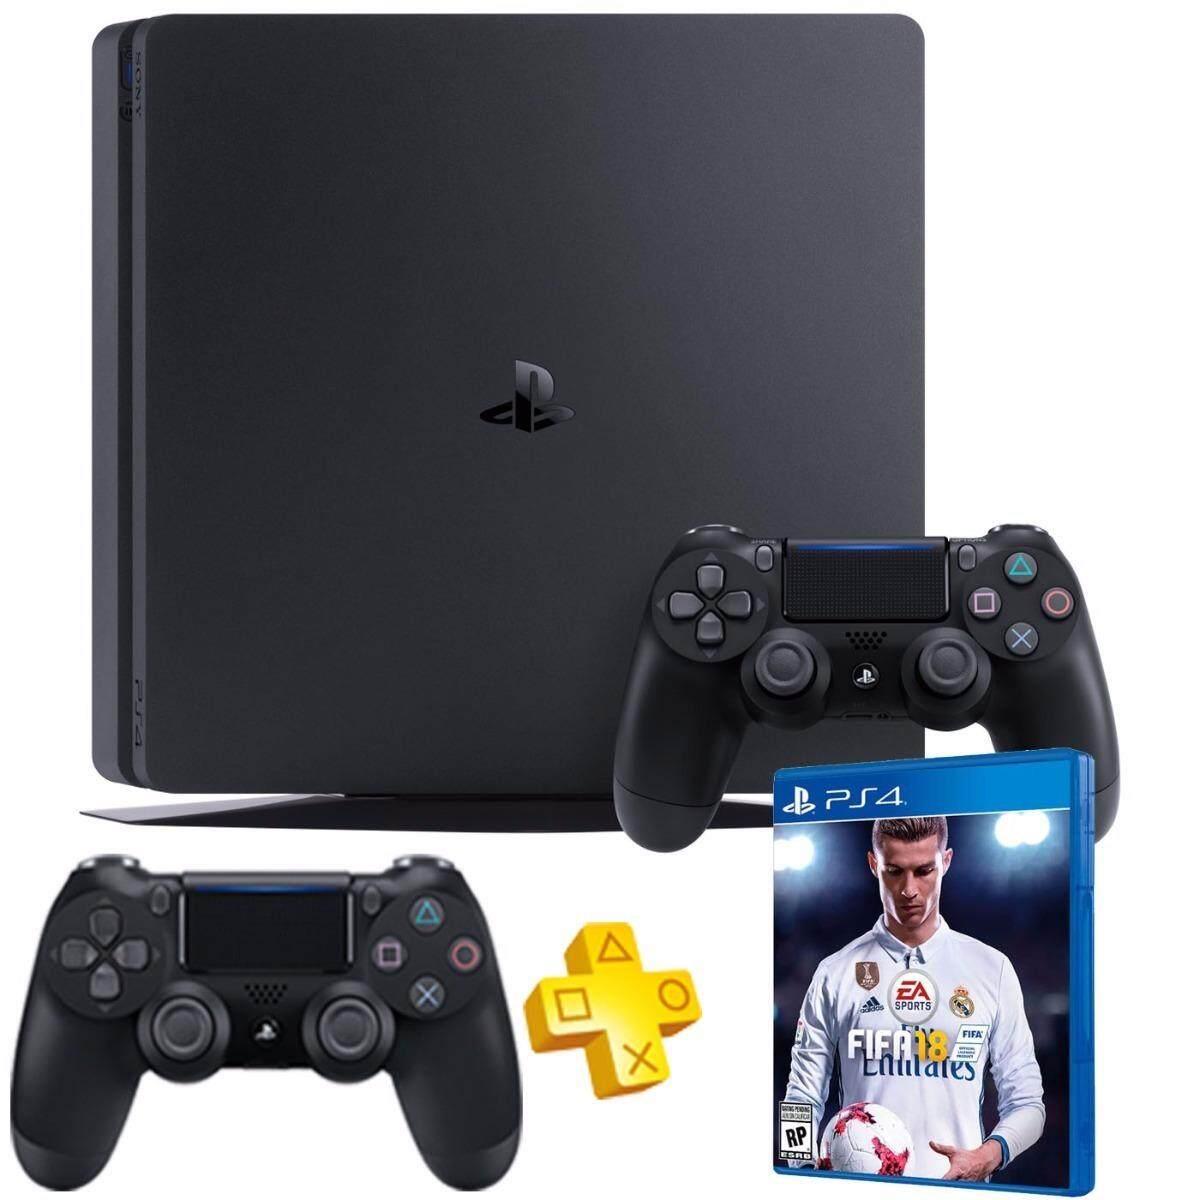 PS4 Slim 500GB ประกันศูนย์ SONY ไทย CUH-2106A (2 จอย) พร้อมแผ่น FIFA18 [Zone 3]